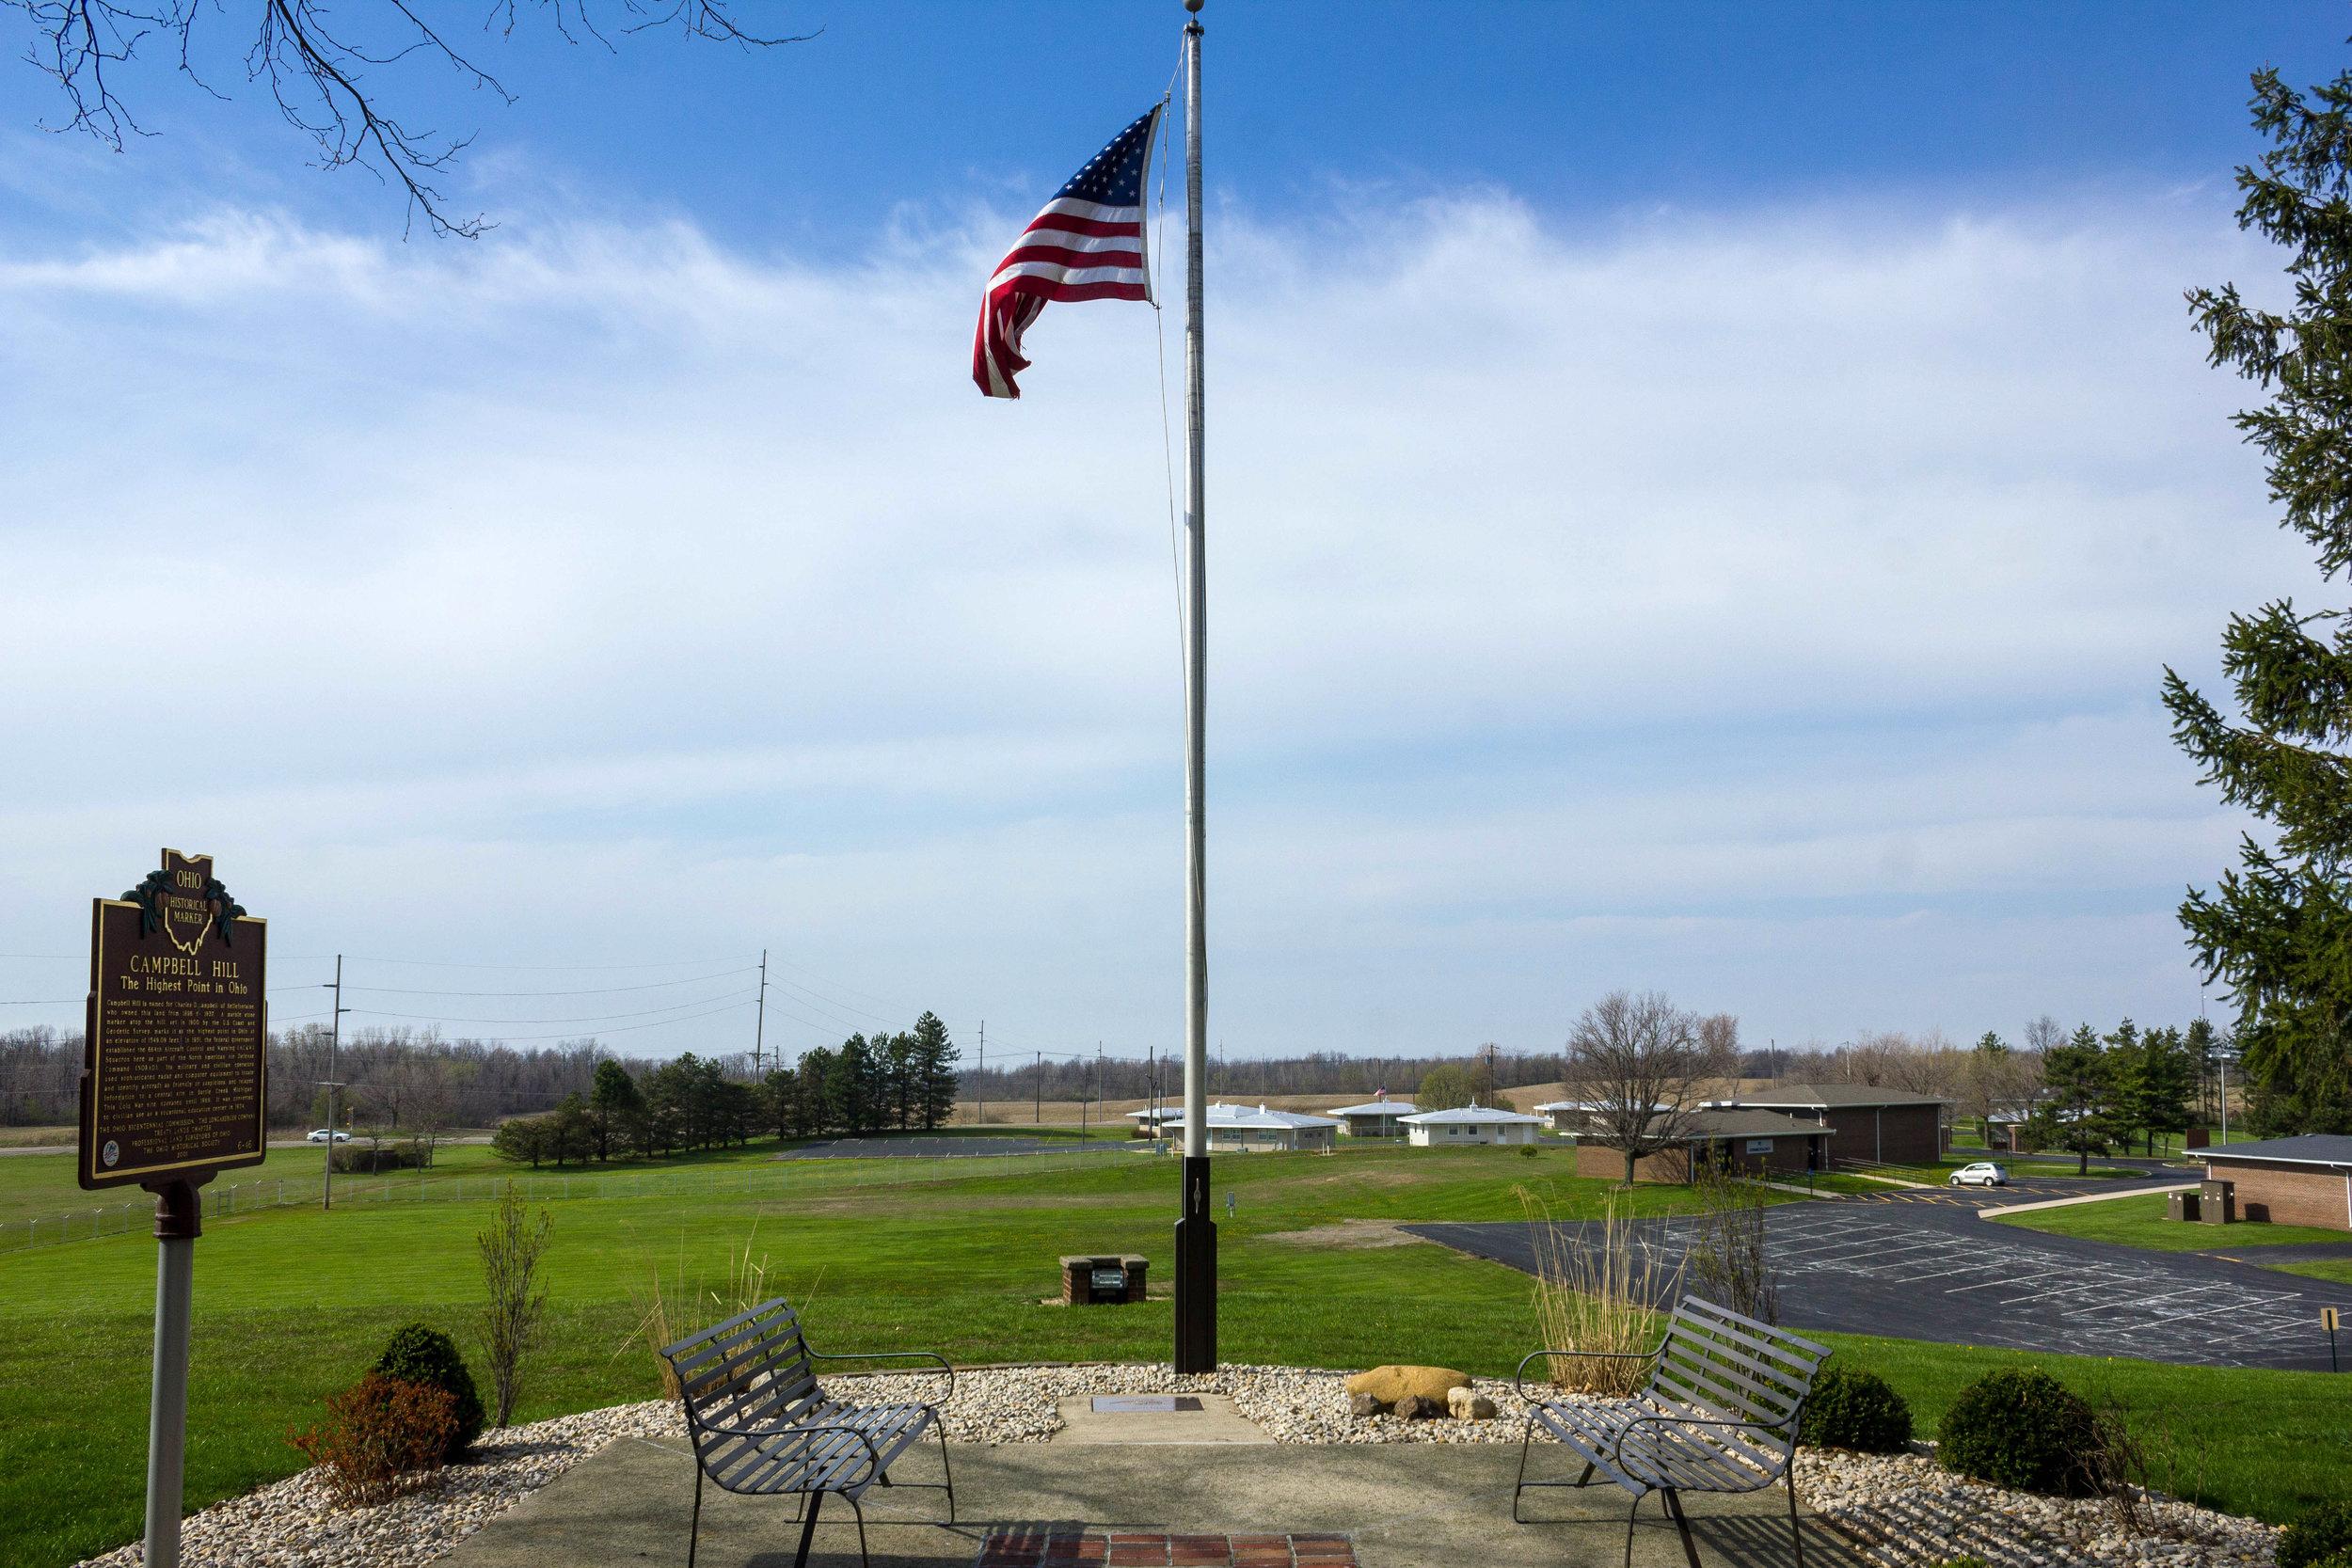 campbell-hill-american-flag-ohio.jpg